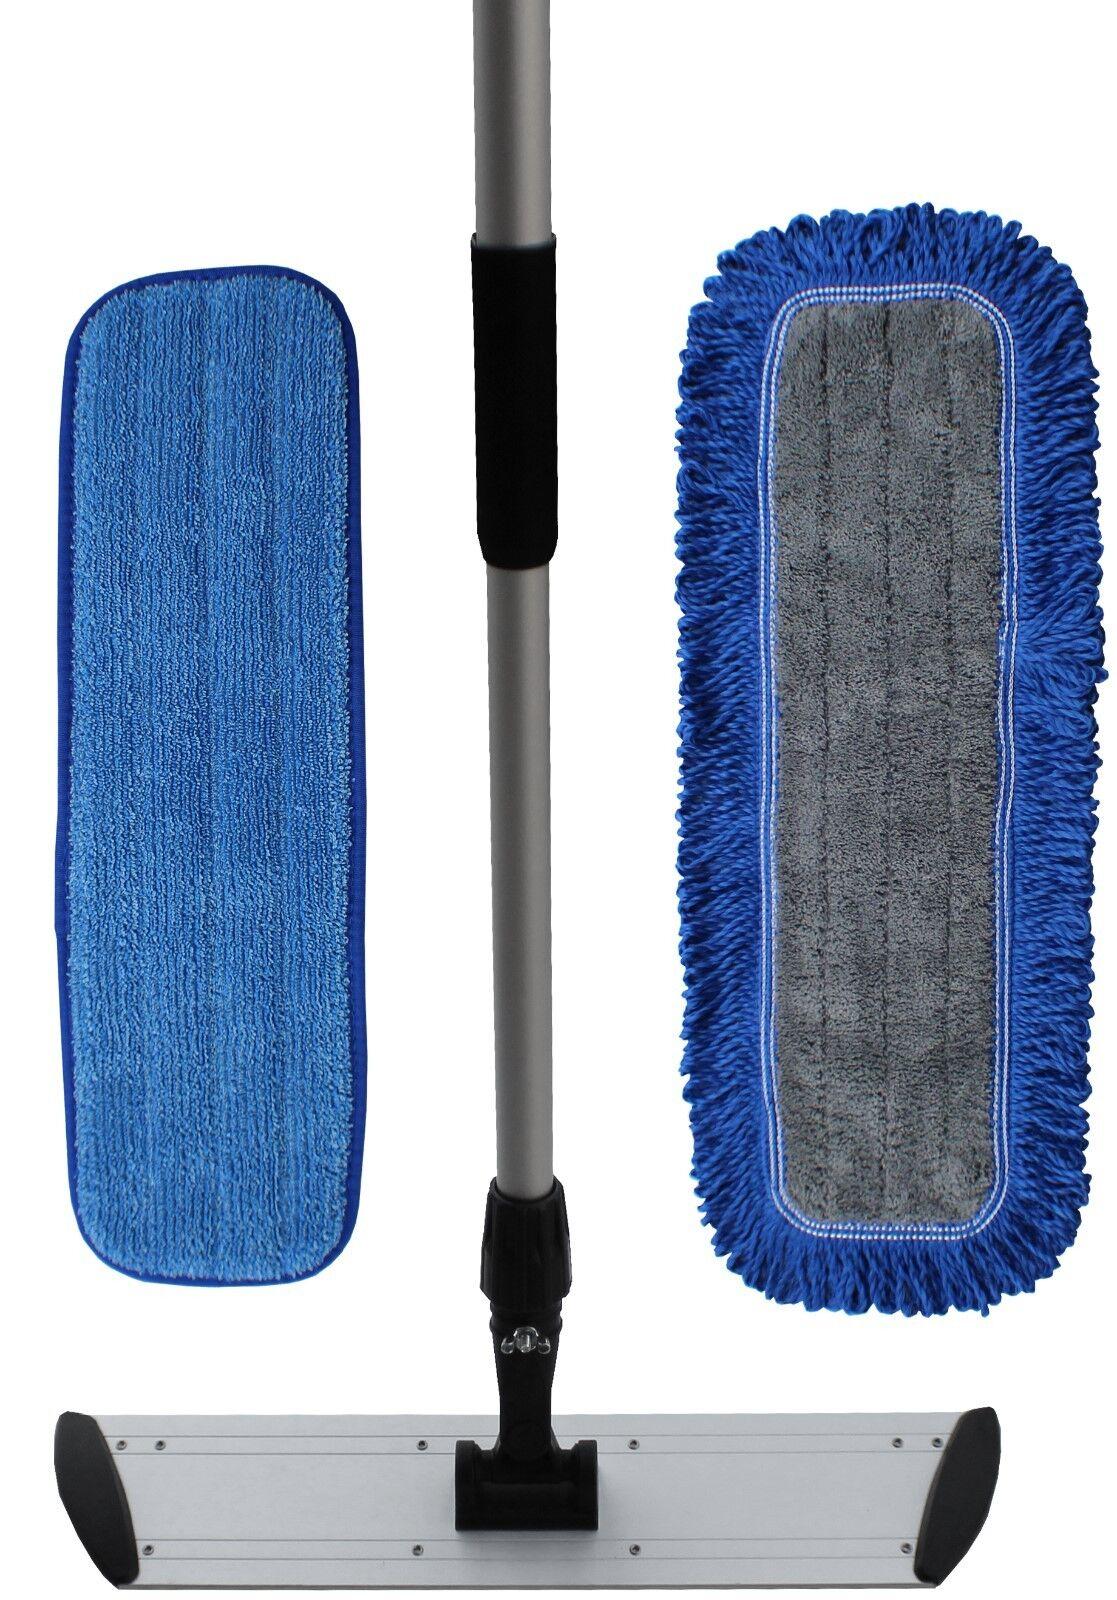 Ultimate 18  Microfiber Mop Kit   Microfiber Mop Pads   Flat Frame   Mop Handle